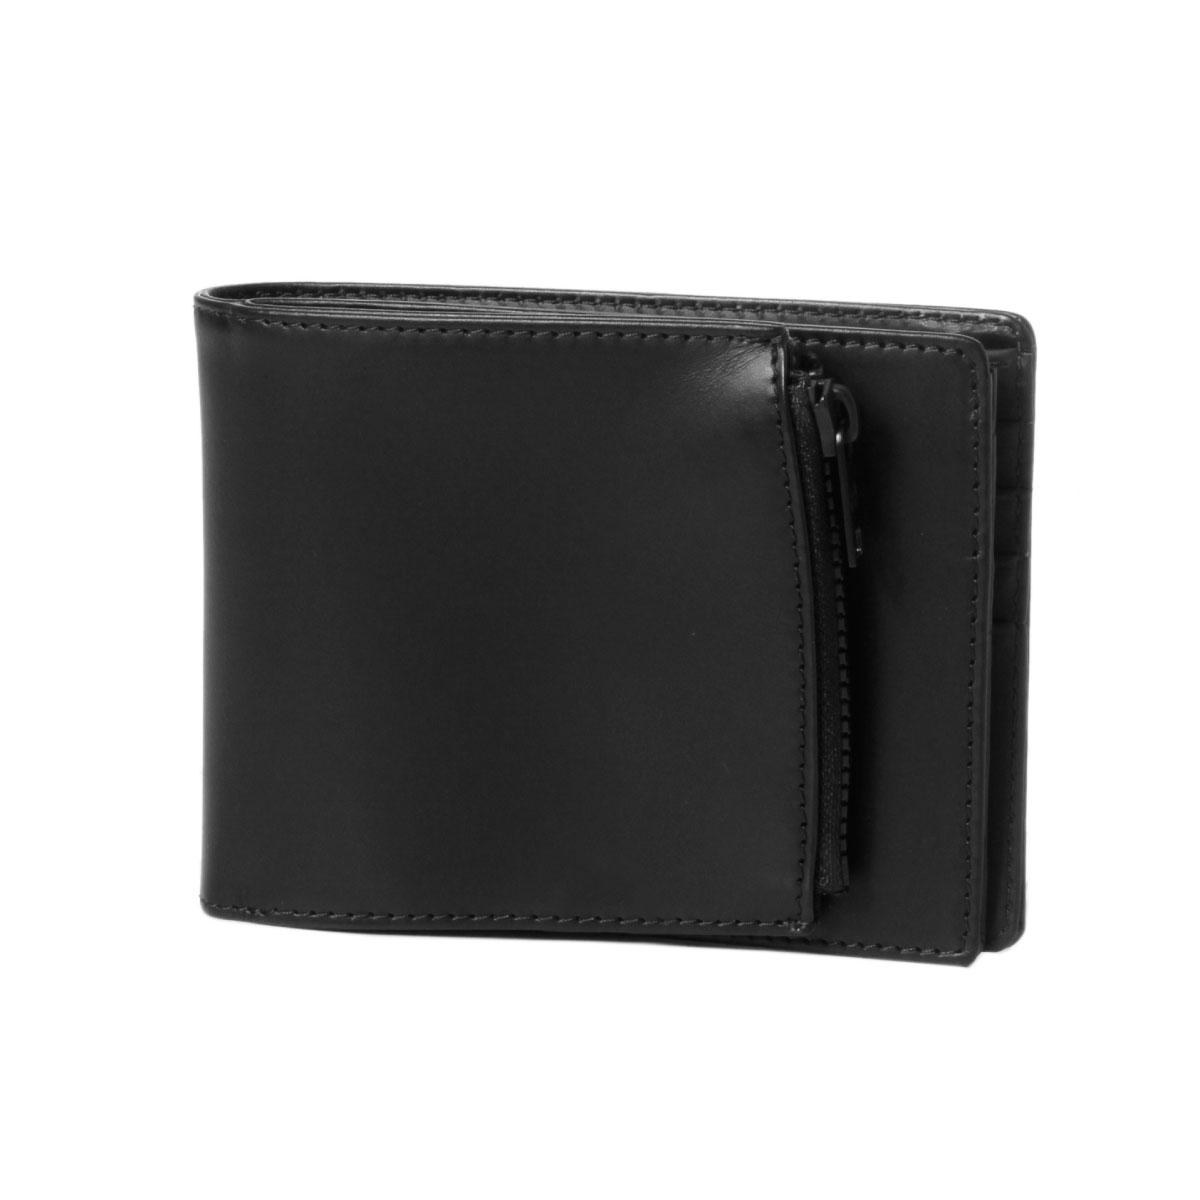 6b997361 メゾンマルジェラ MAISON MARGIELA wallet men S35UI0436 PS935 T8013 line 11 folio  wallet BLACK black